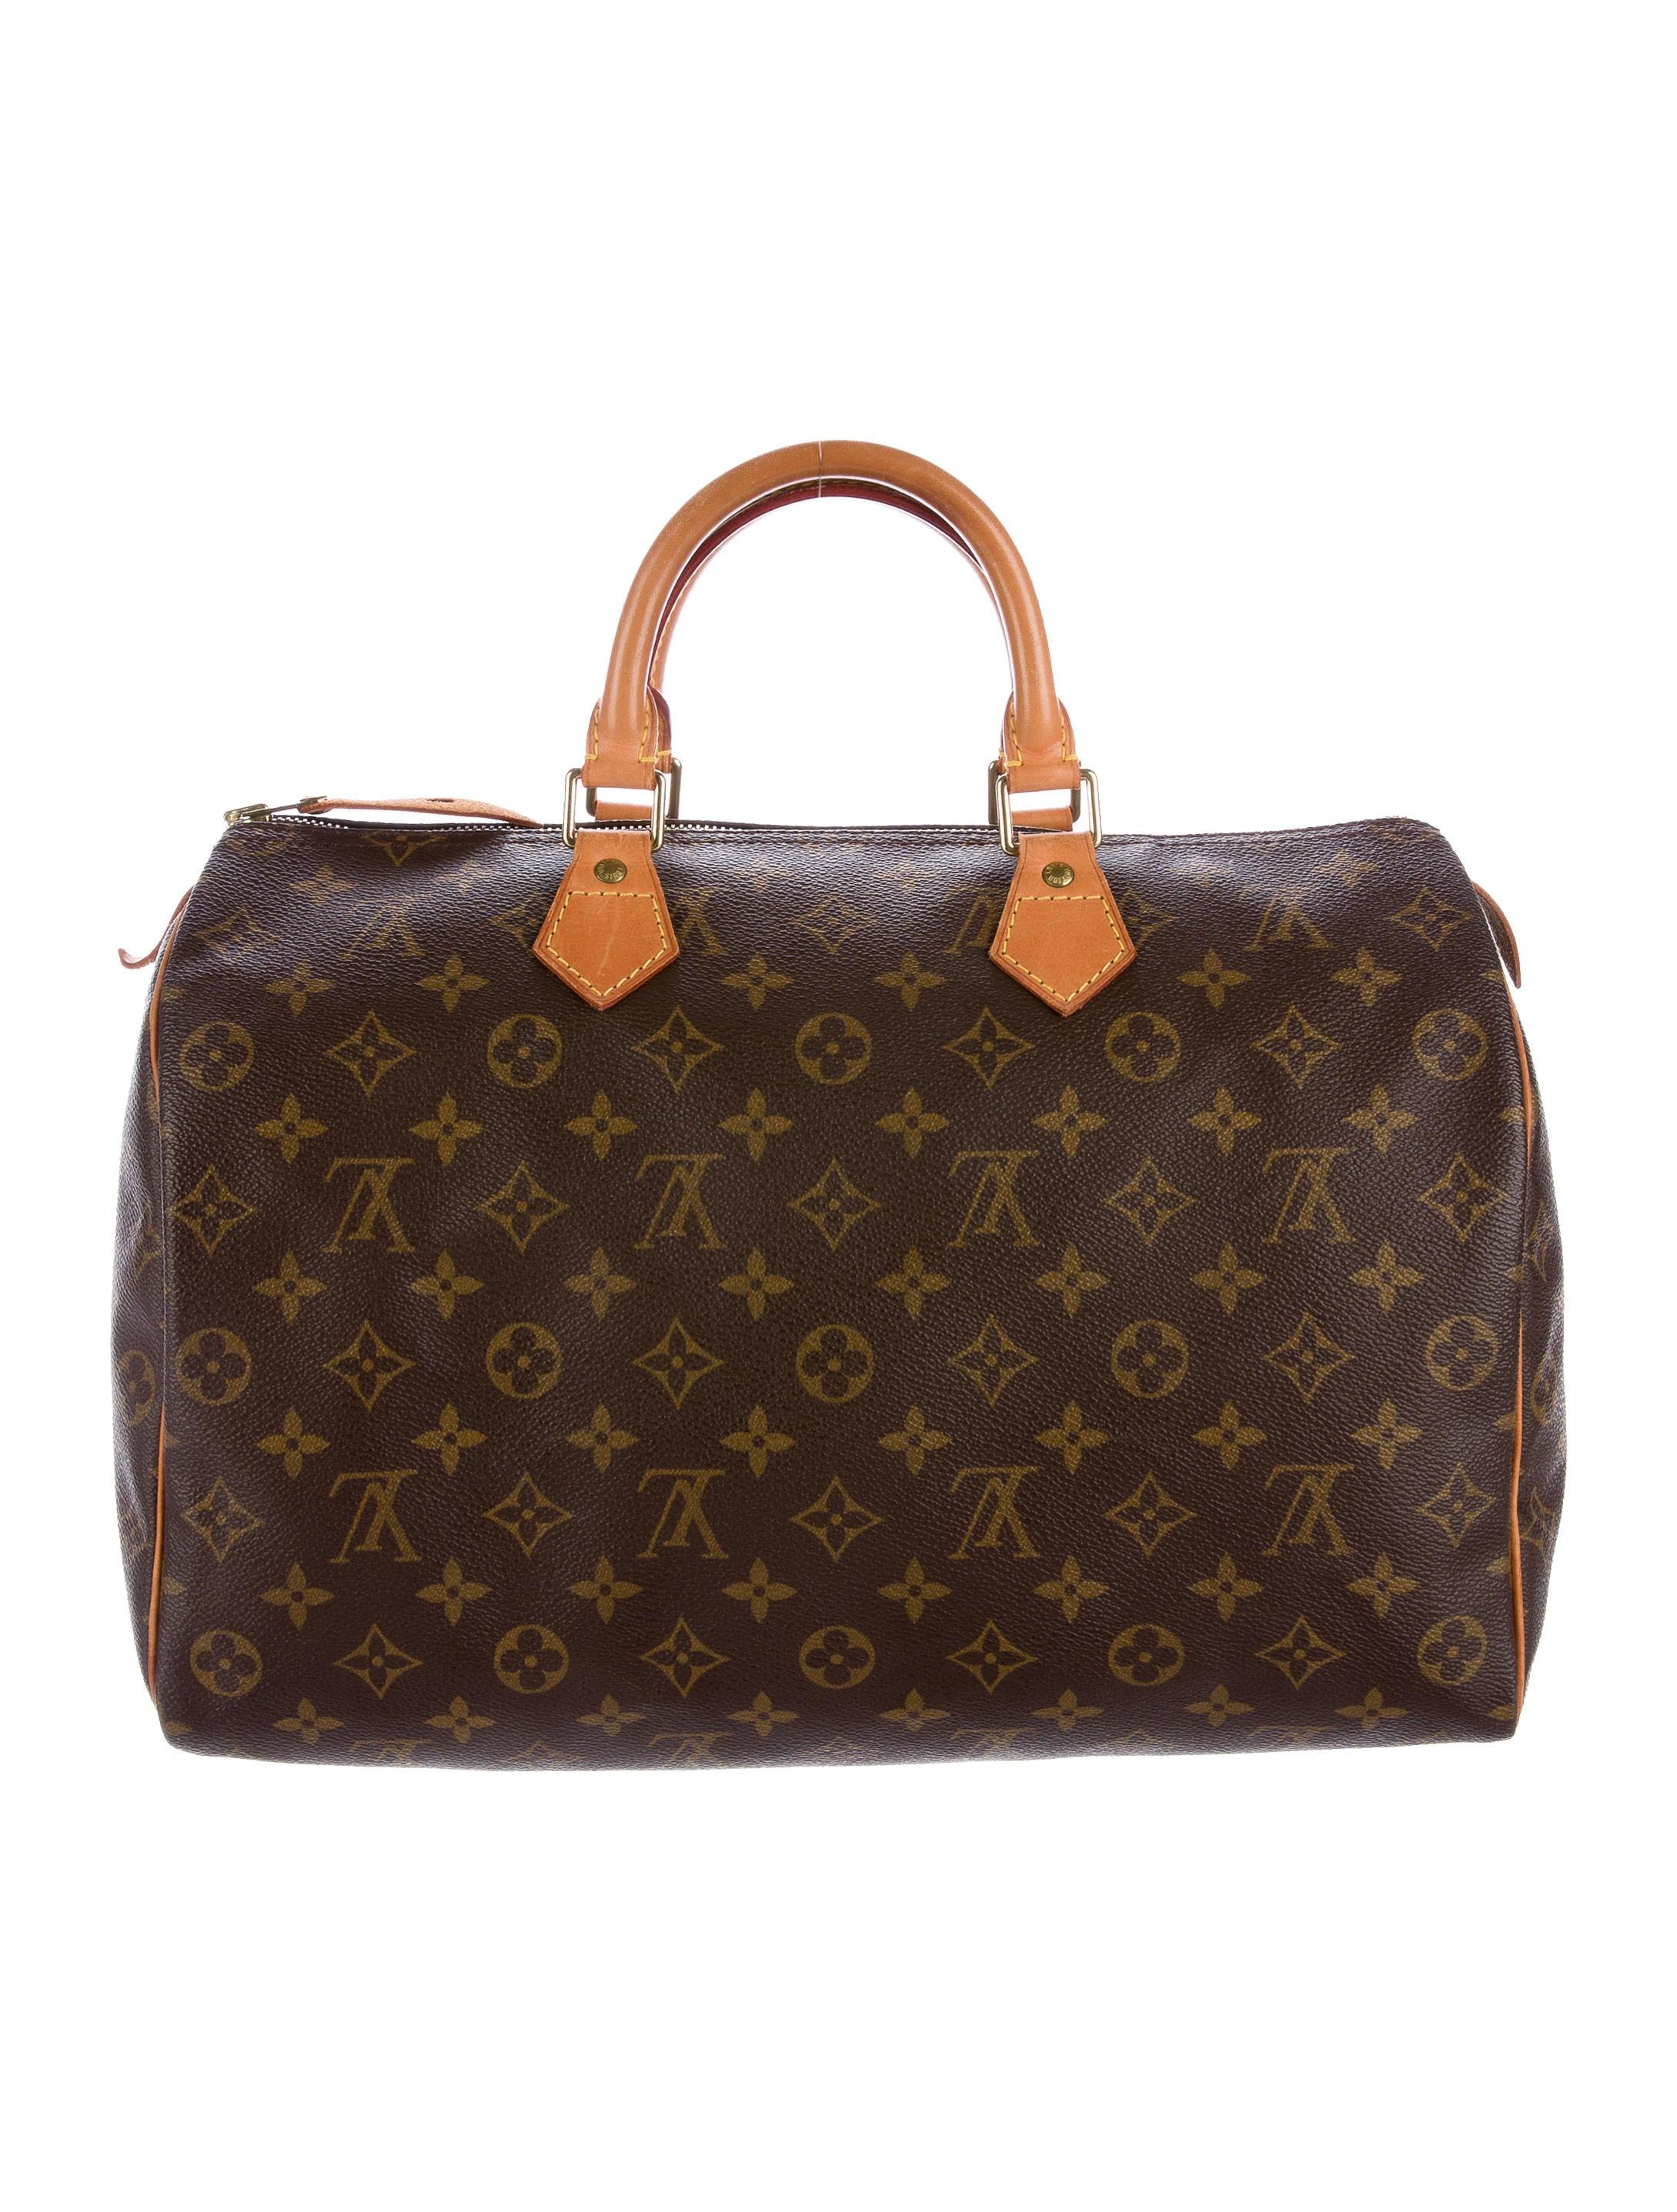 Louis vuitton monogram speedy 35 handbags lou115001 for Louis vuitton miroir speedy 35